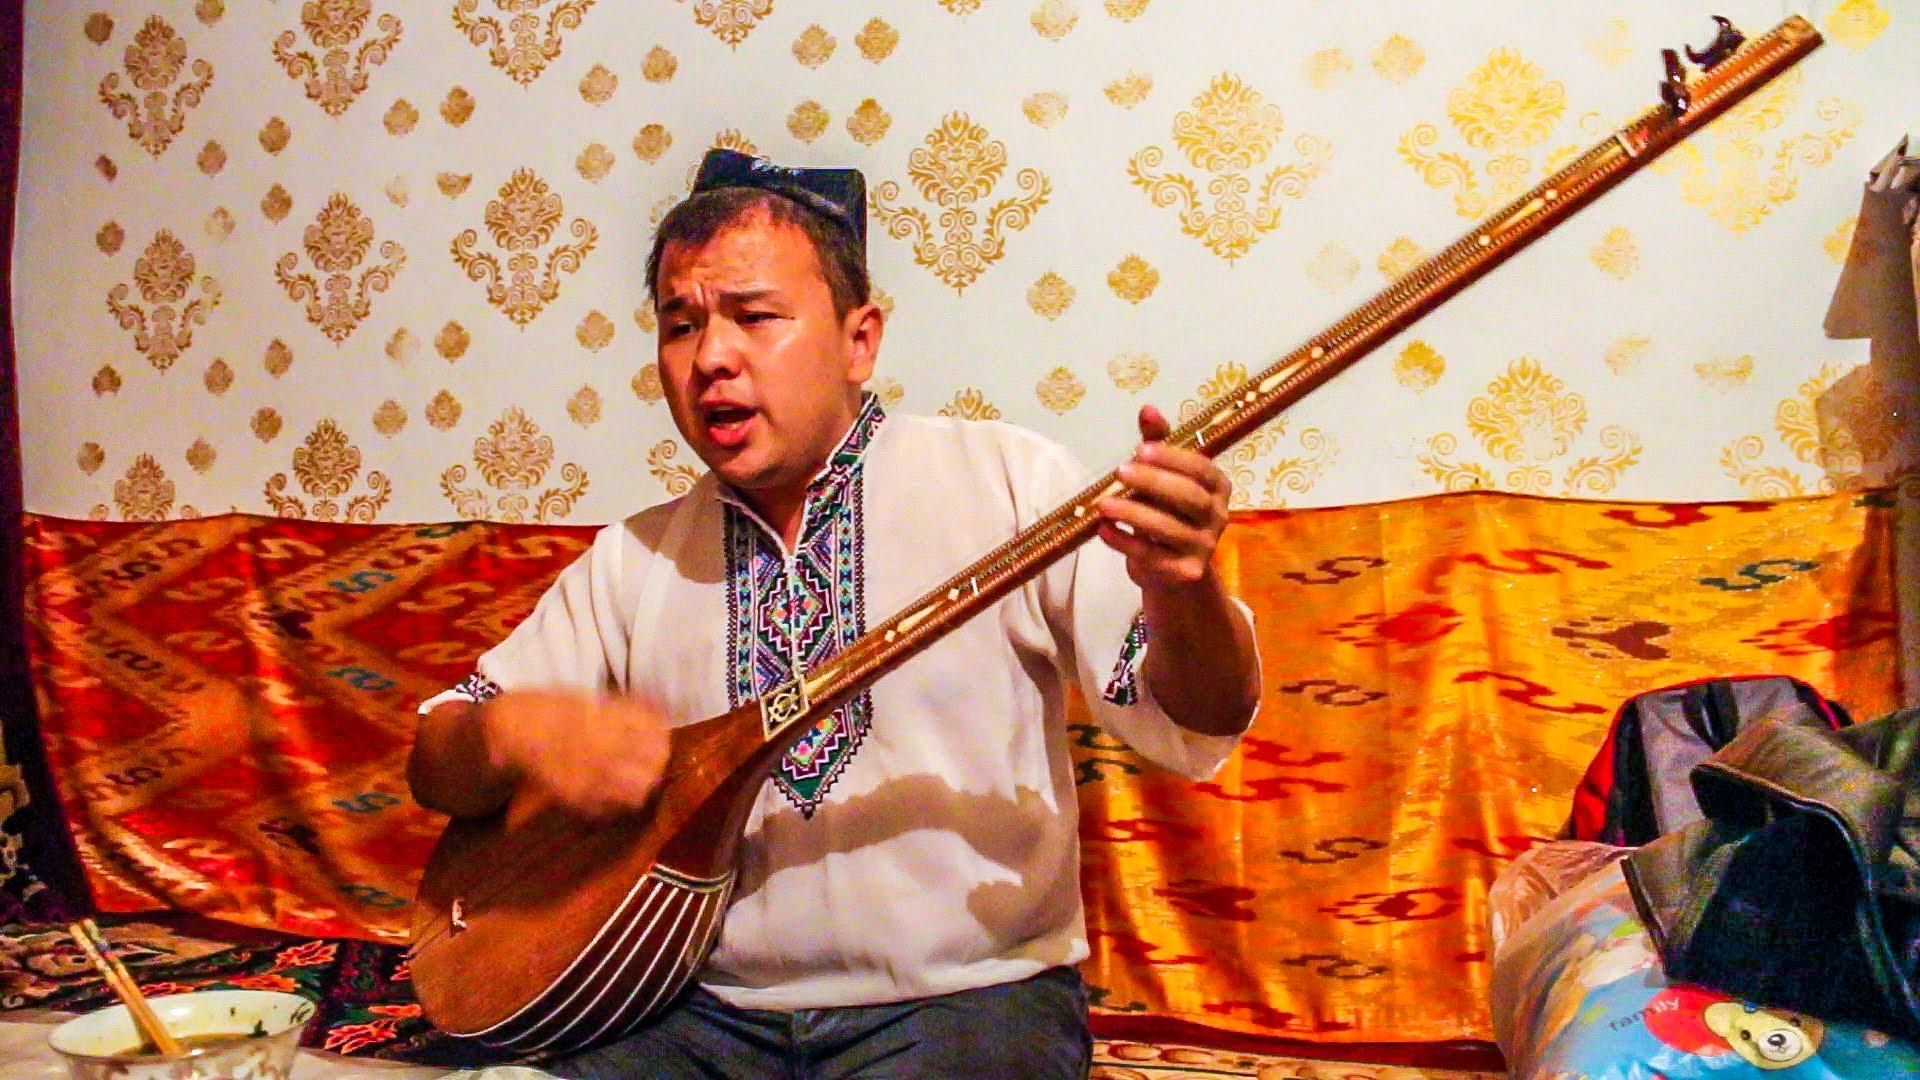 Ютуб музыка узбекская классика, Узбекская классическая музыка video 24 фотография